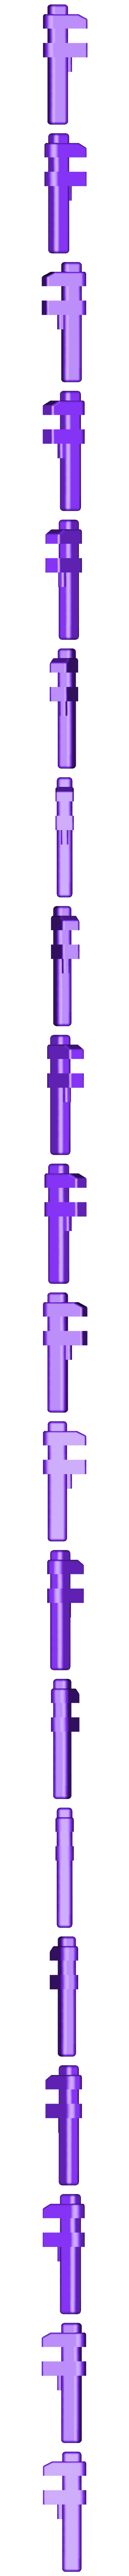 playmobil_crab_tool.stl Download free STL file Playmobil toolbox with tools • 3D printable template, sokinkeso